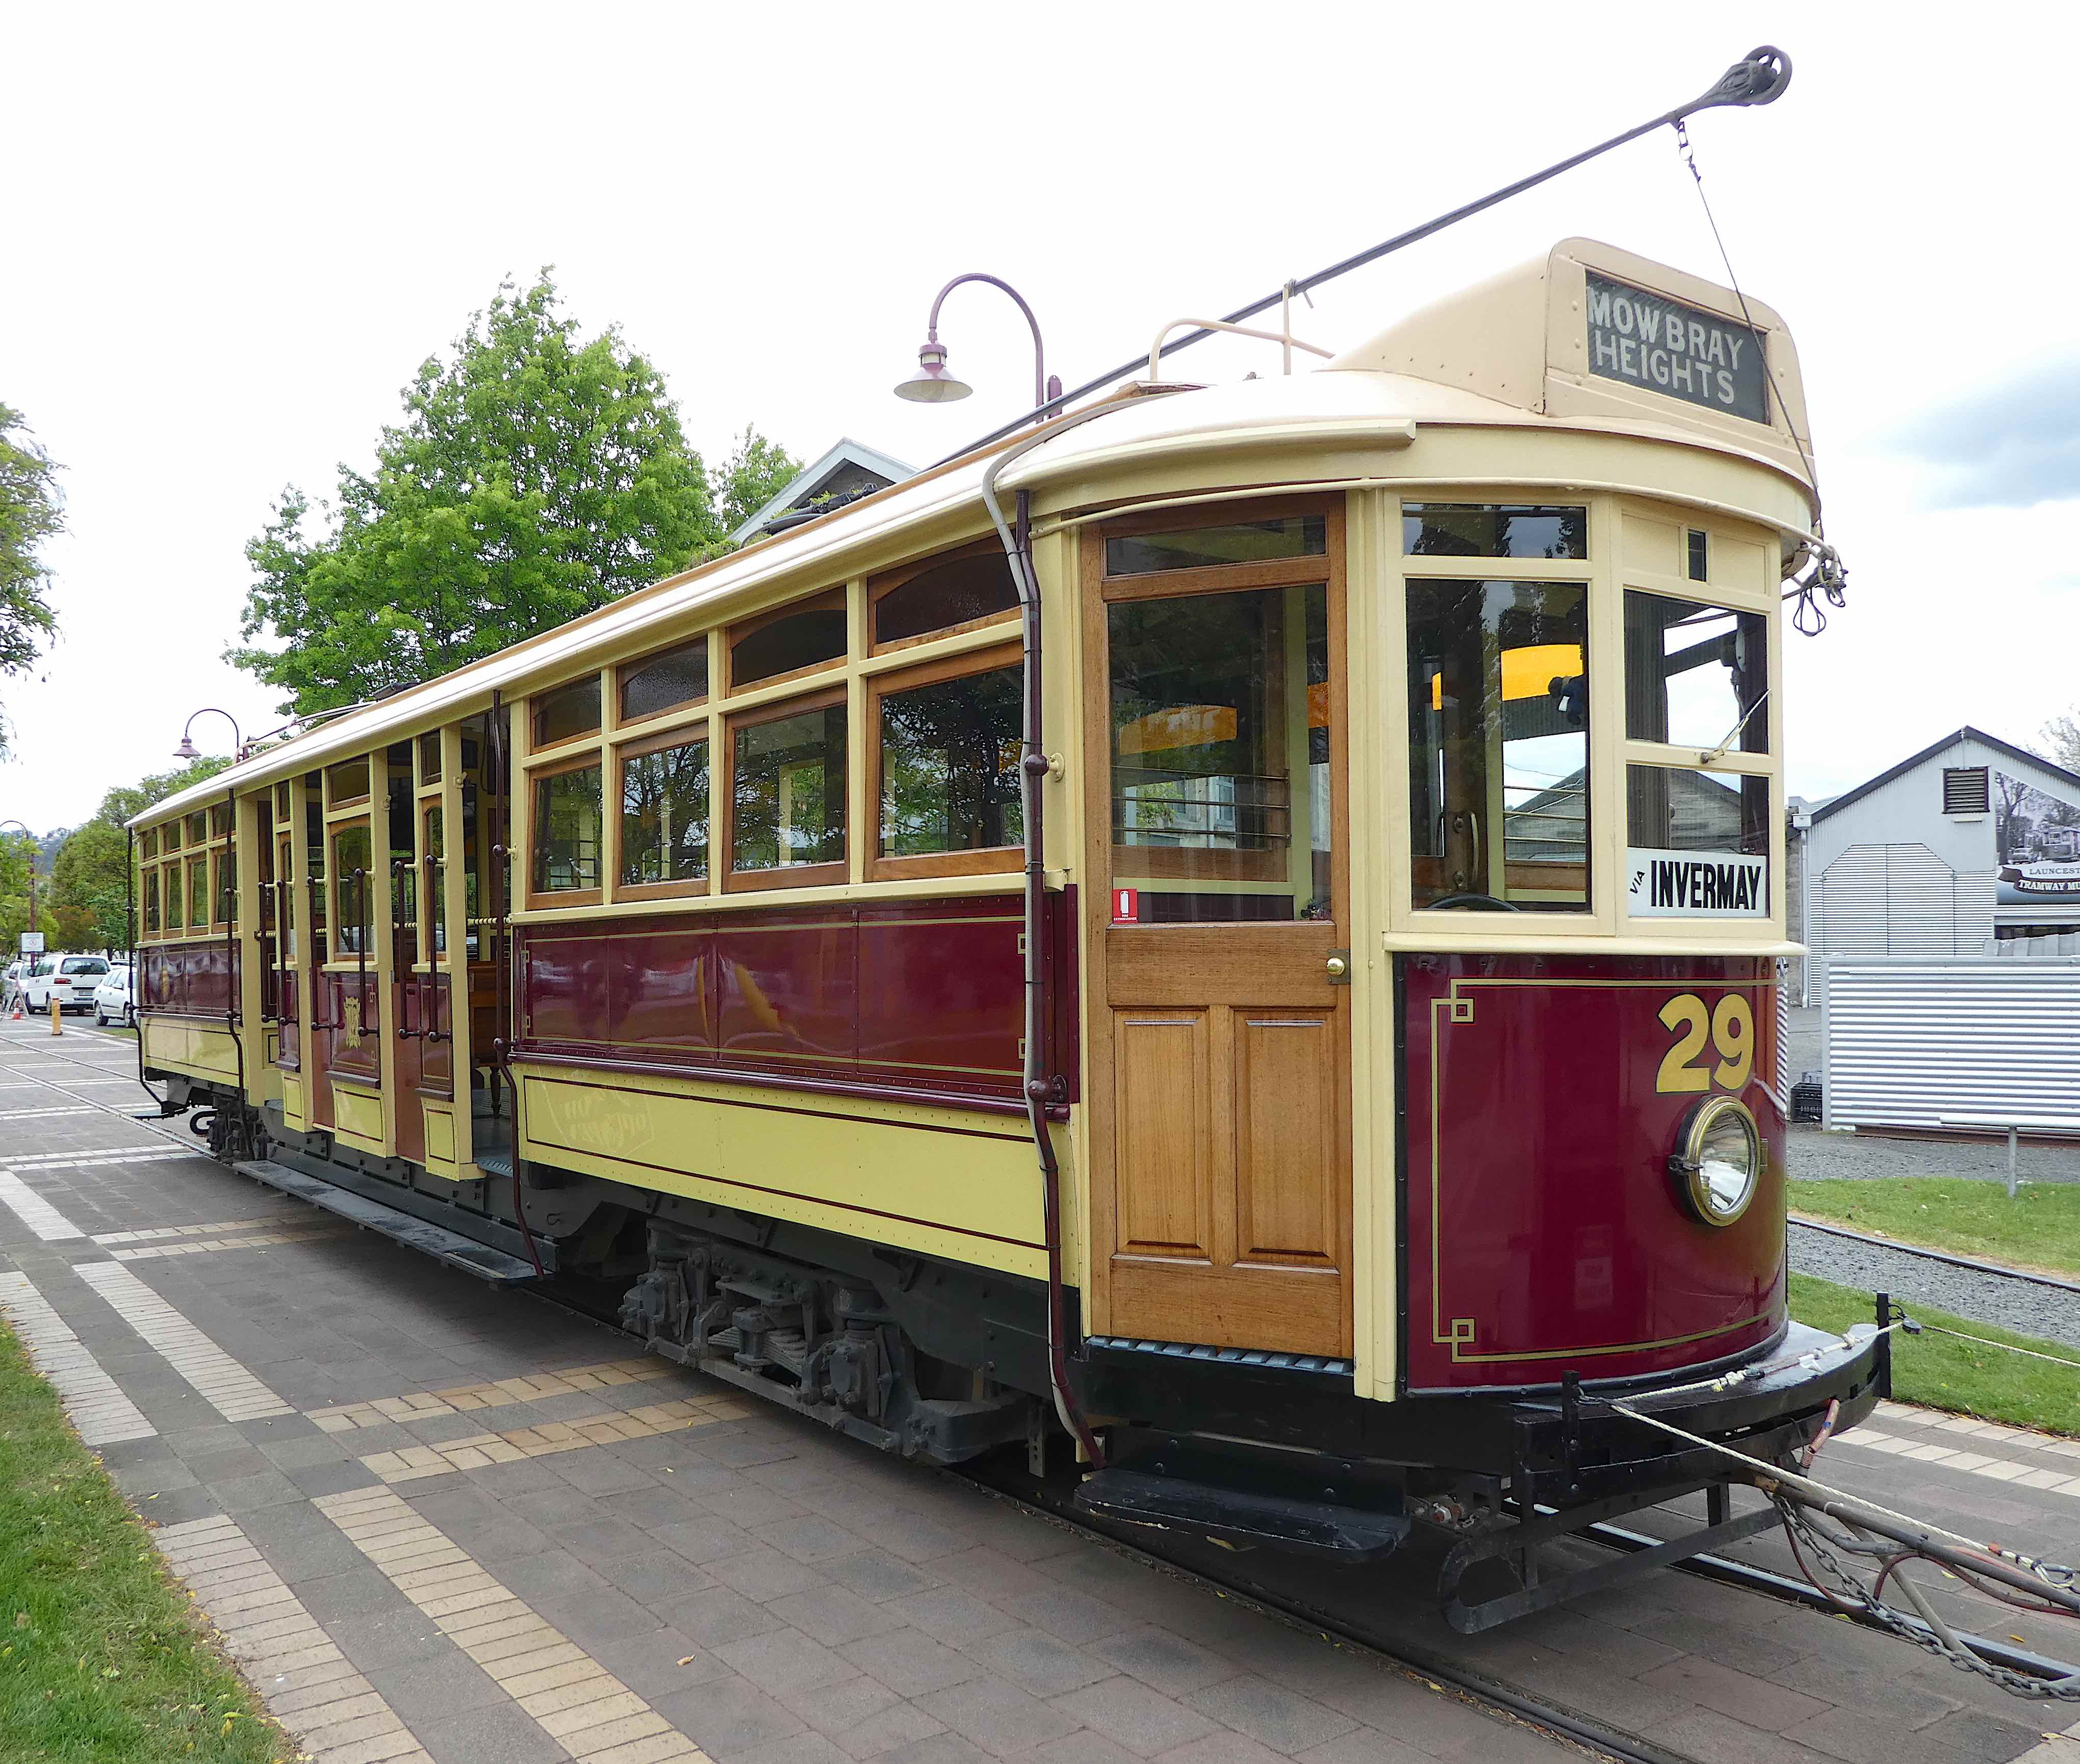 16-tram